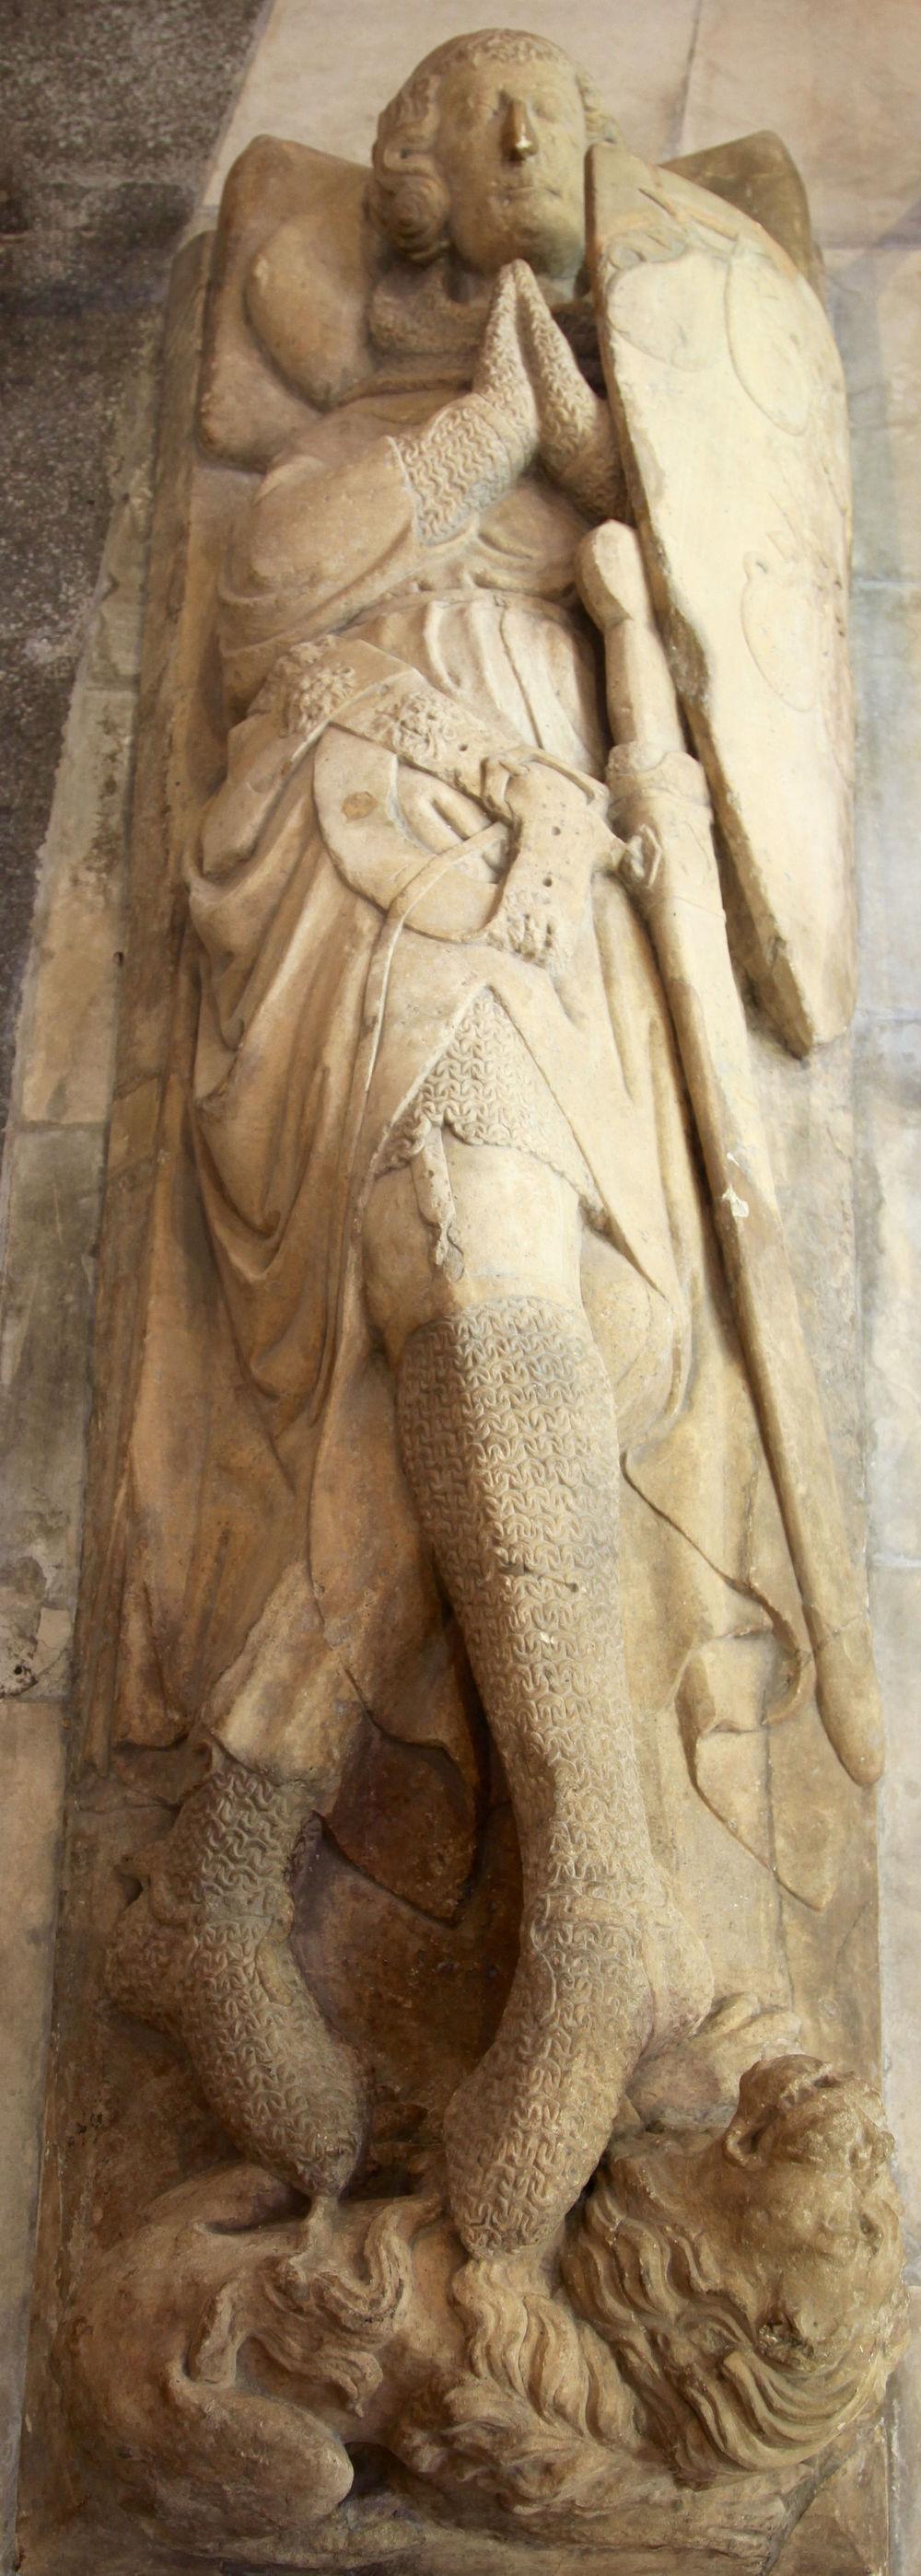 Effigy of a Templar knight in the Temple Church, London